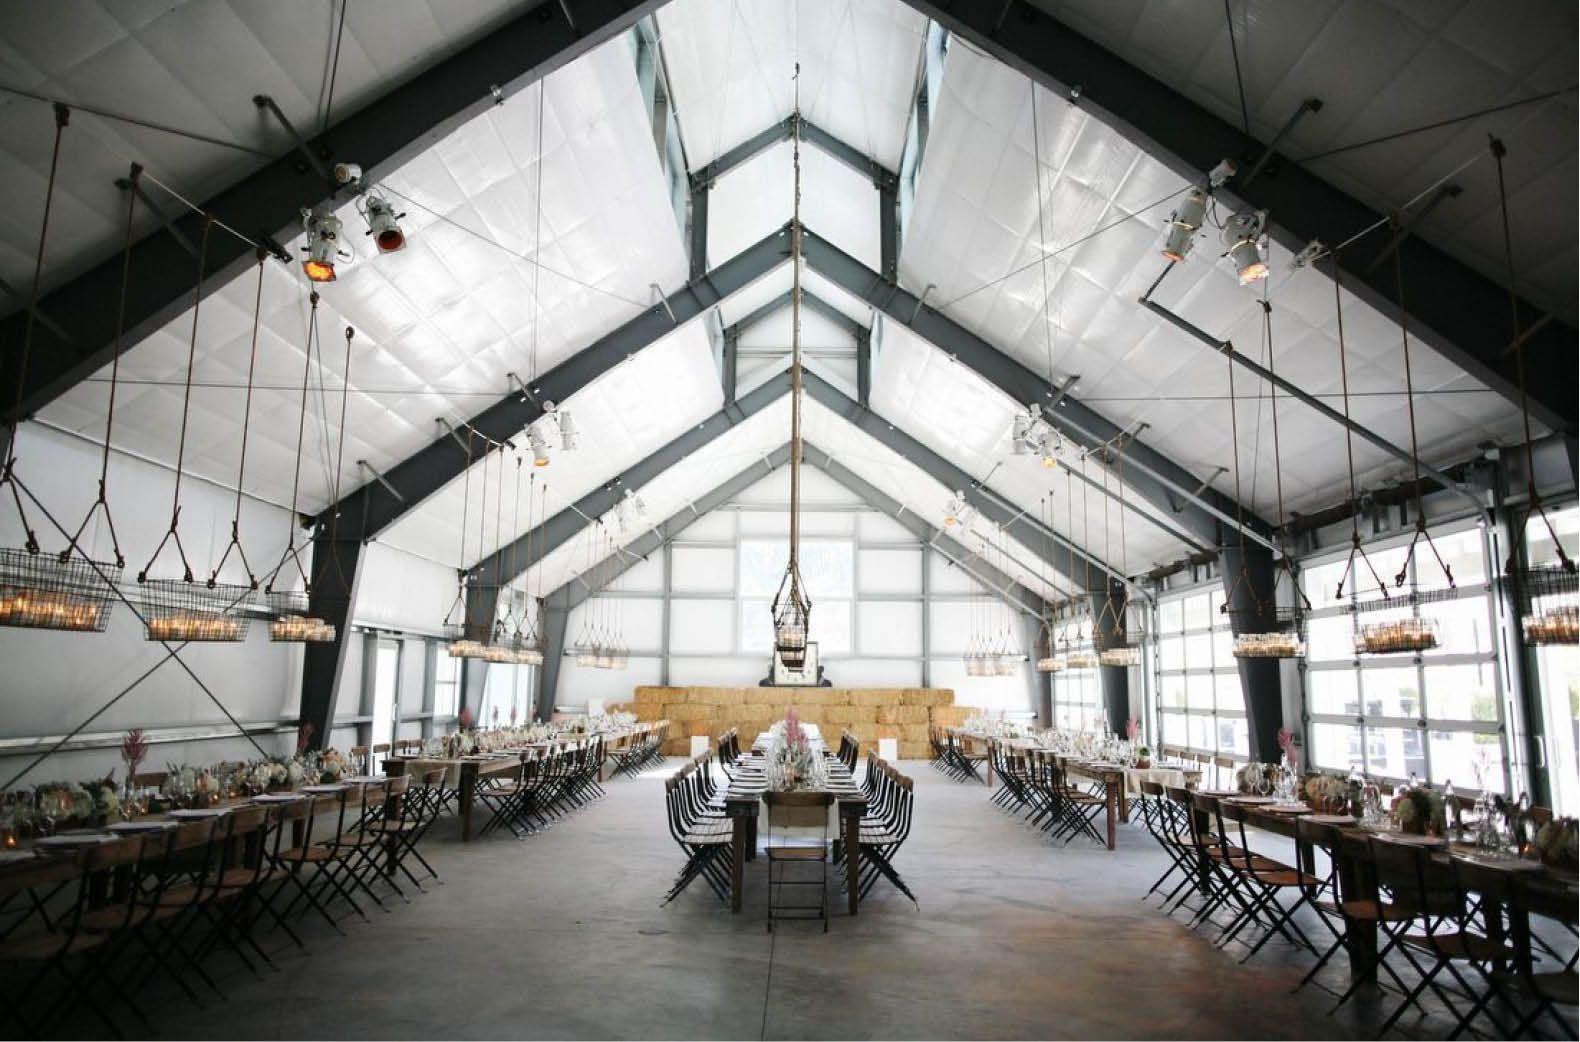 Renewing Your Vows Venue West Orange: Industrial Barn Bash At Durham Ranch